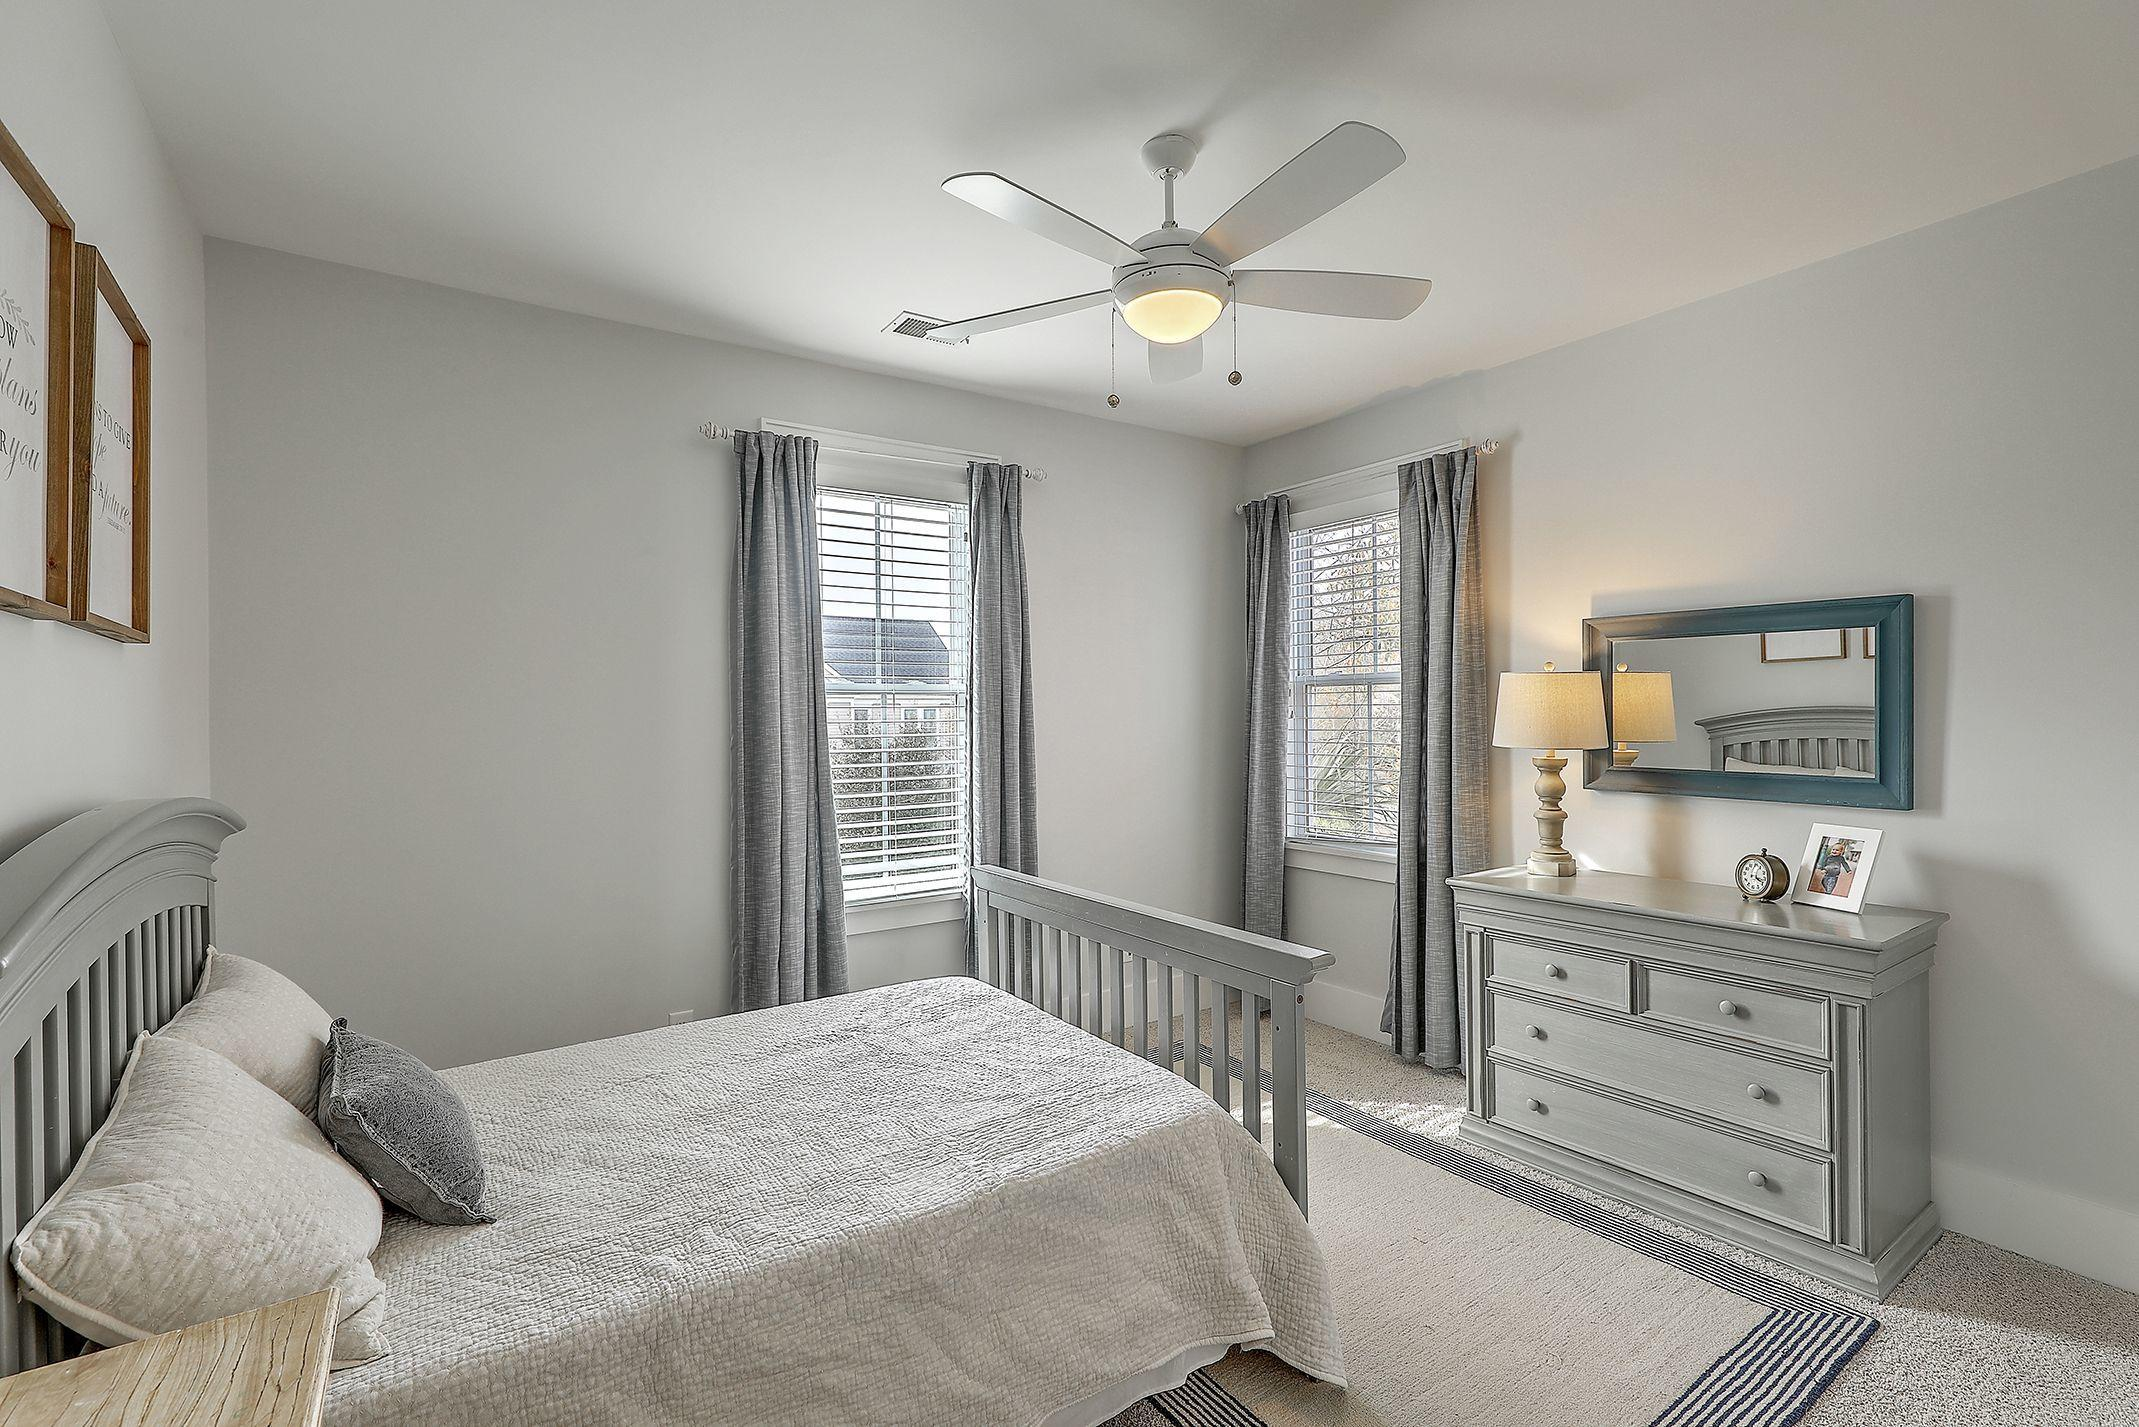 Carolina Park Homes For Sale - 1466 Gunnison, Mount Pleasant, SC - 33